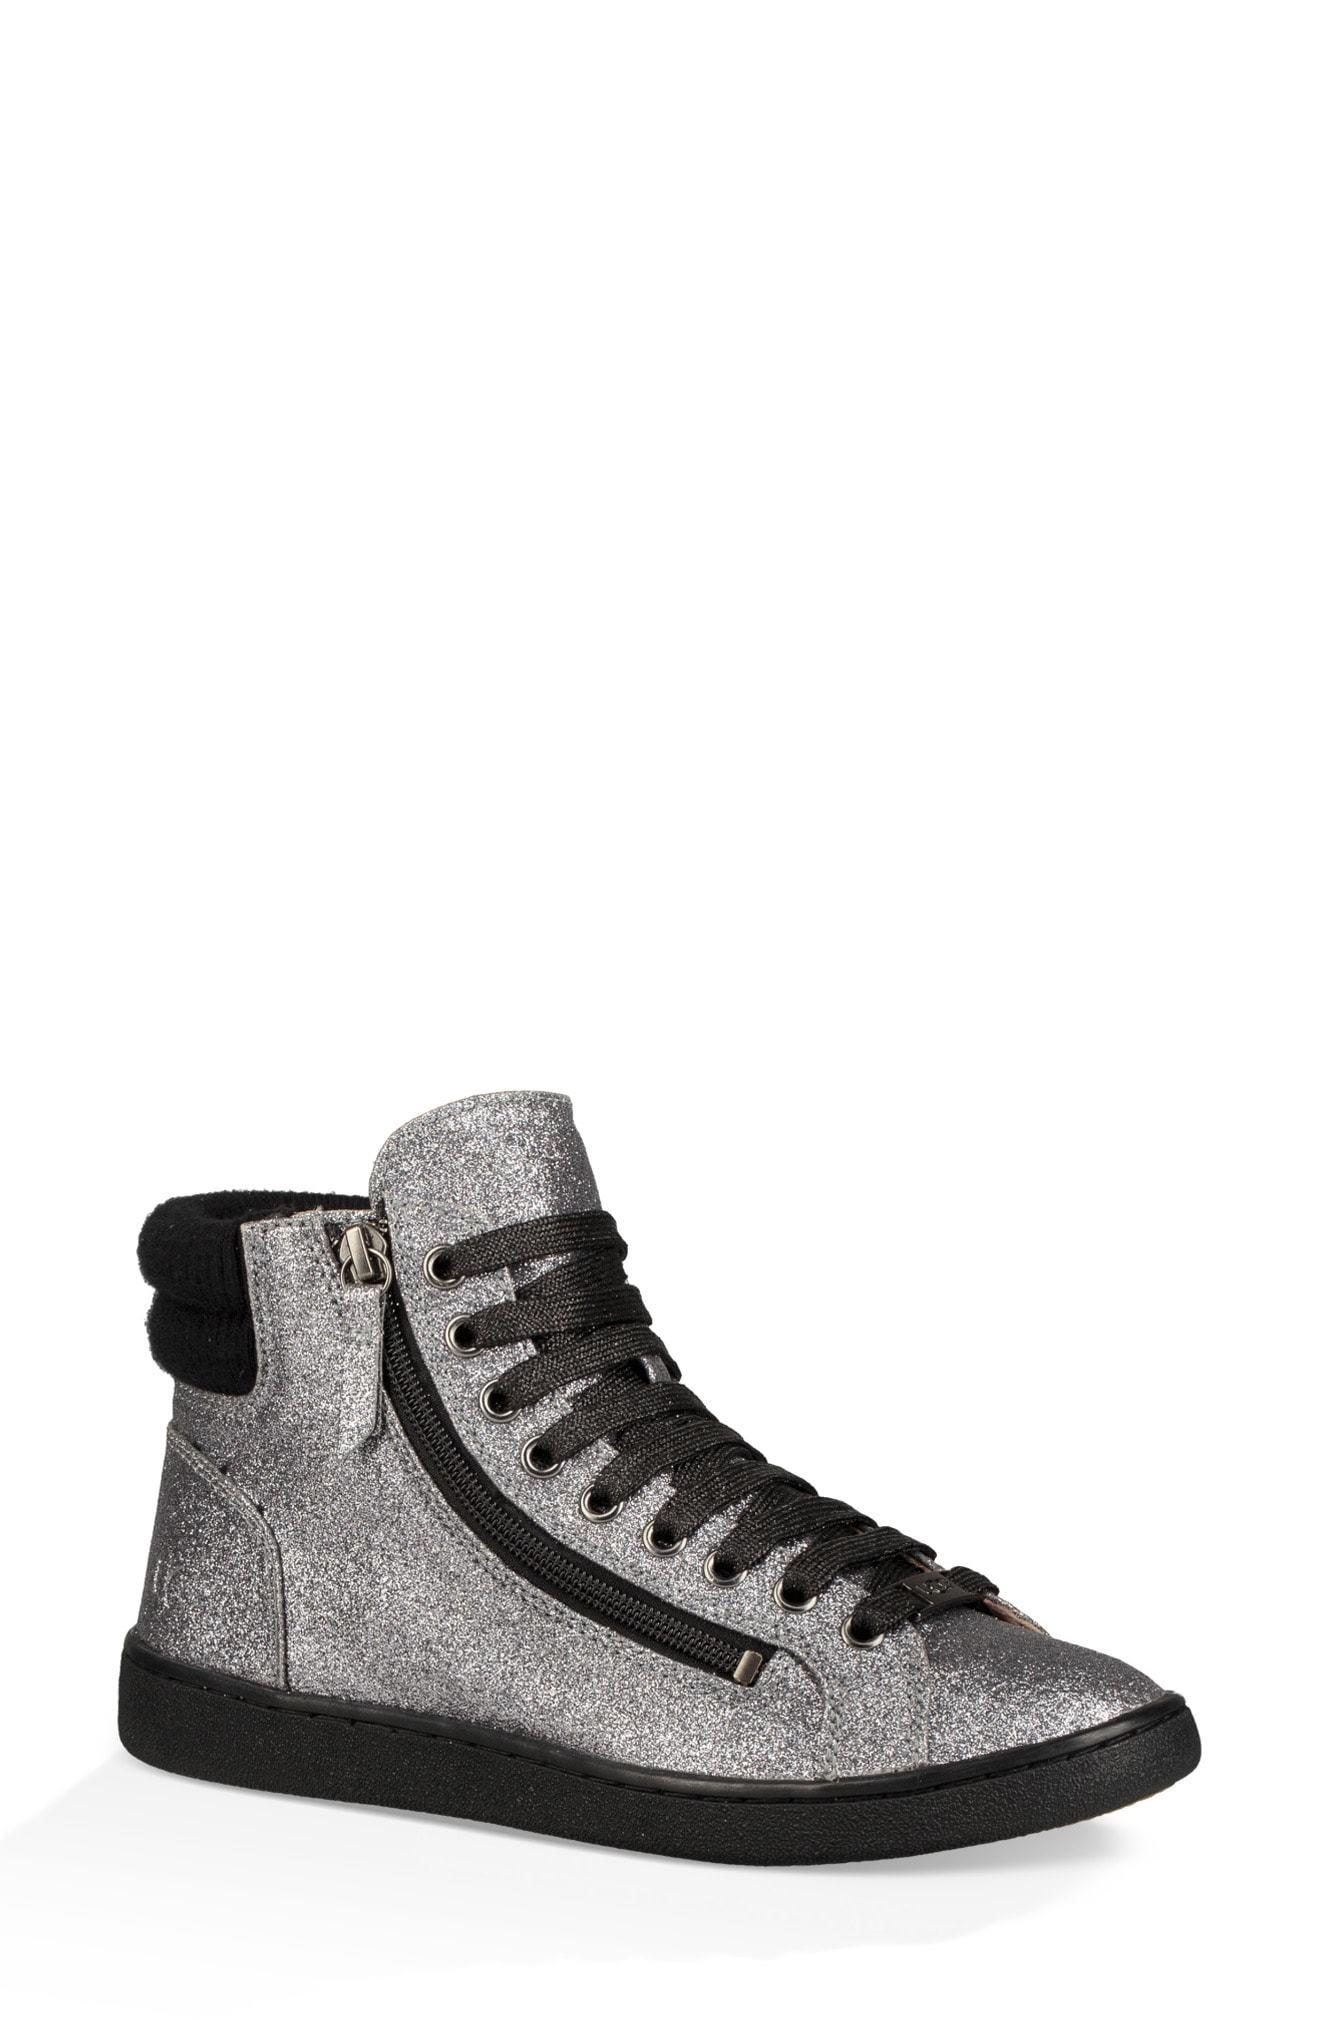 2d9b3495e79 Olive Glitter Sneaker